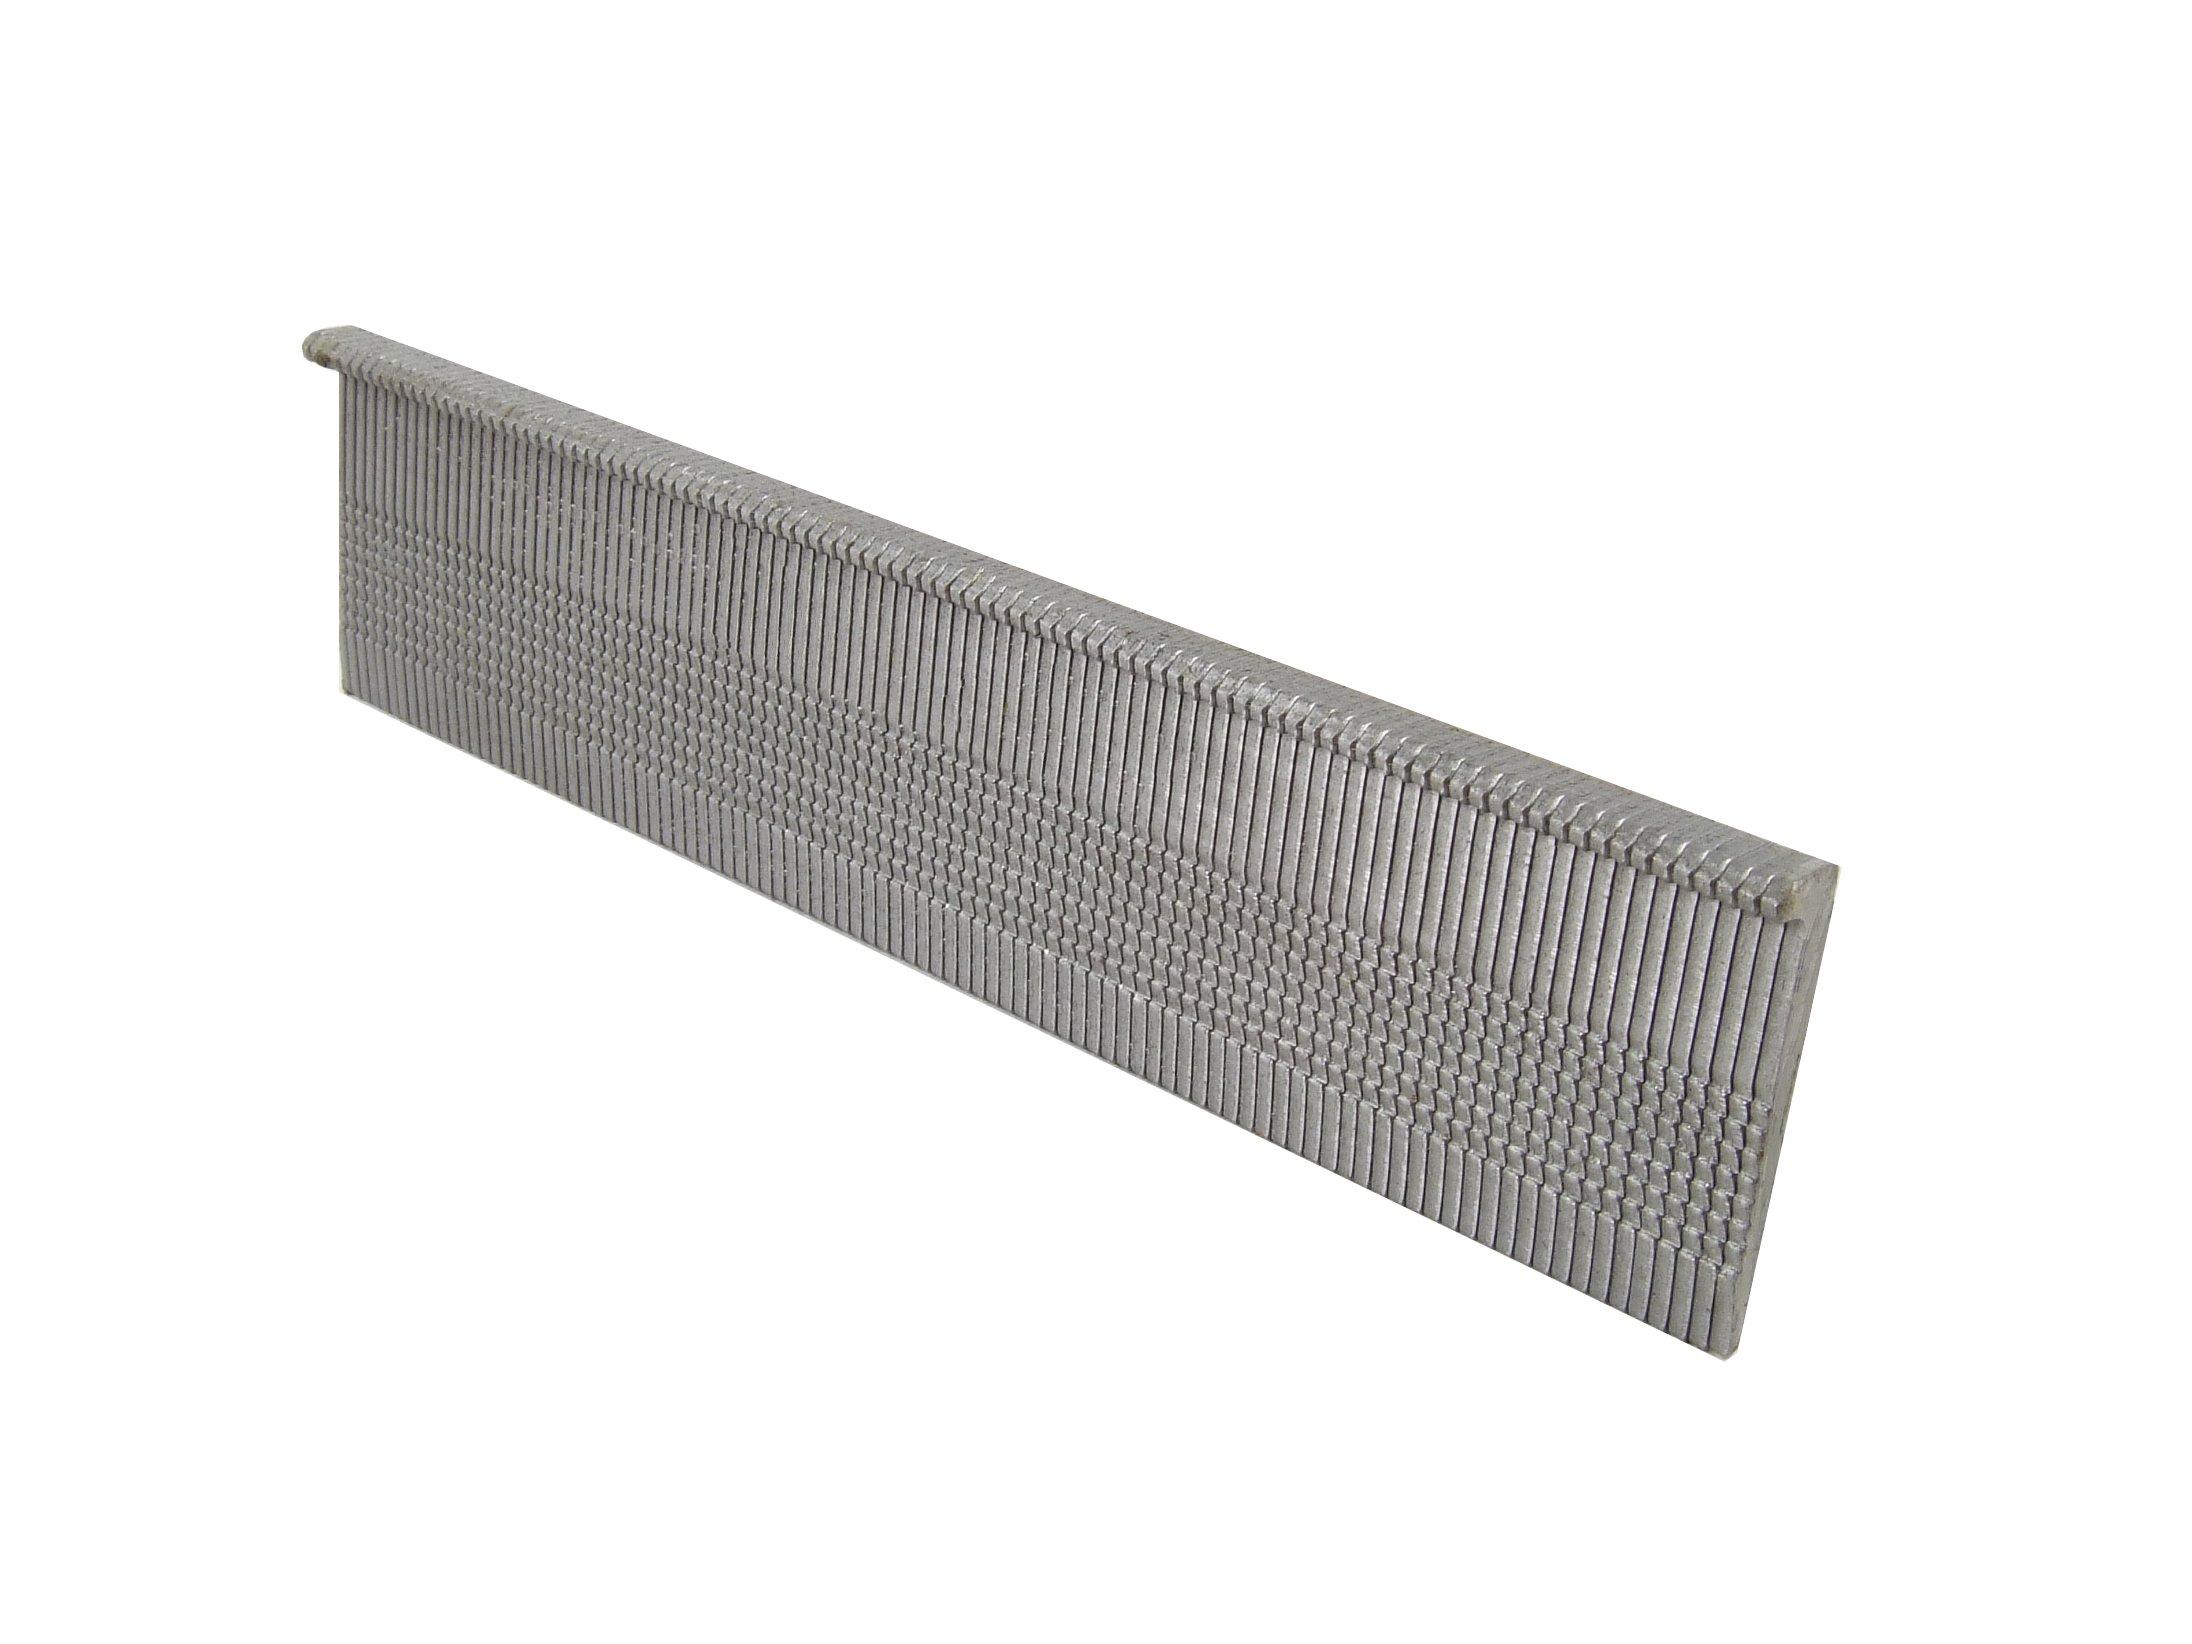 B&C Eagle LC-2 2-Inch Galvanized L-Cleat Hardwood Flooring Nails (1,000 per box)